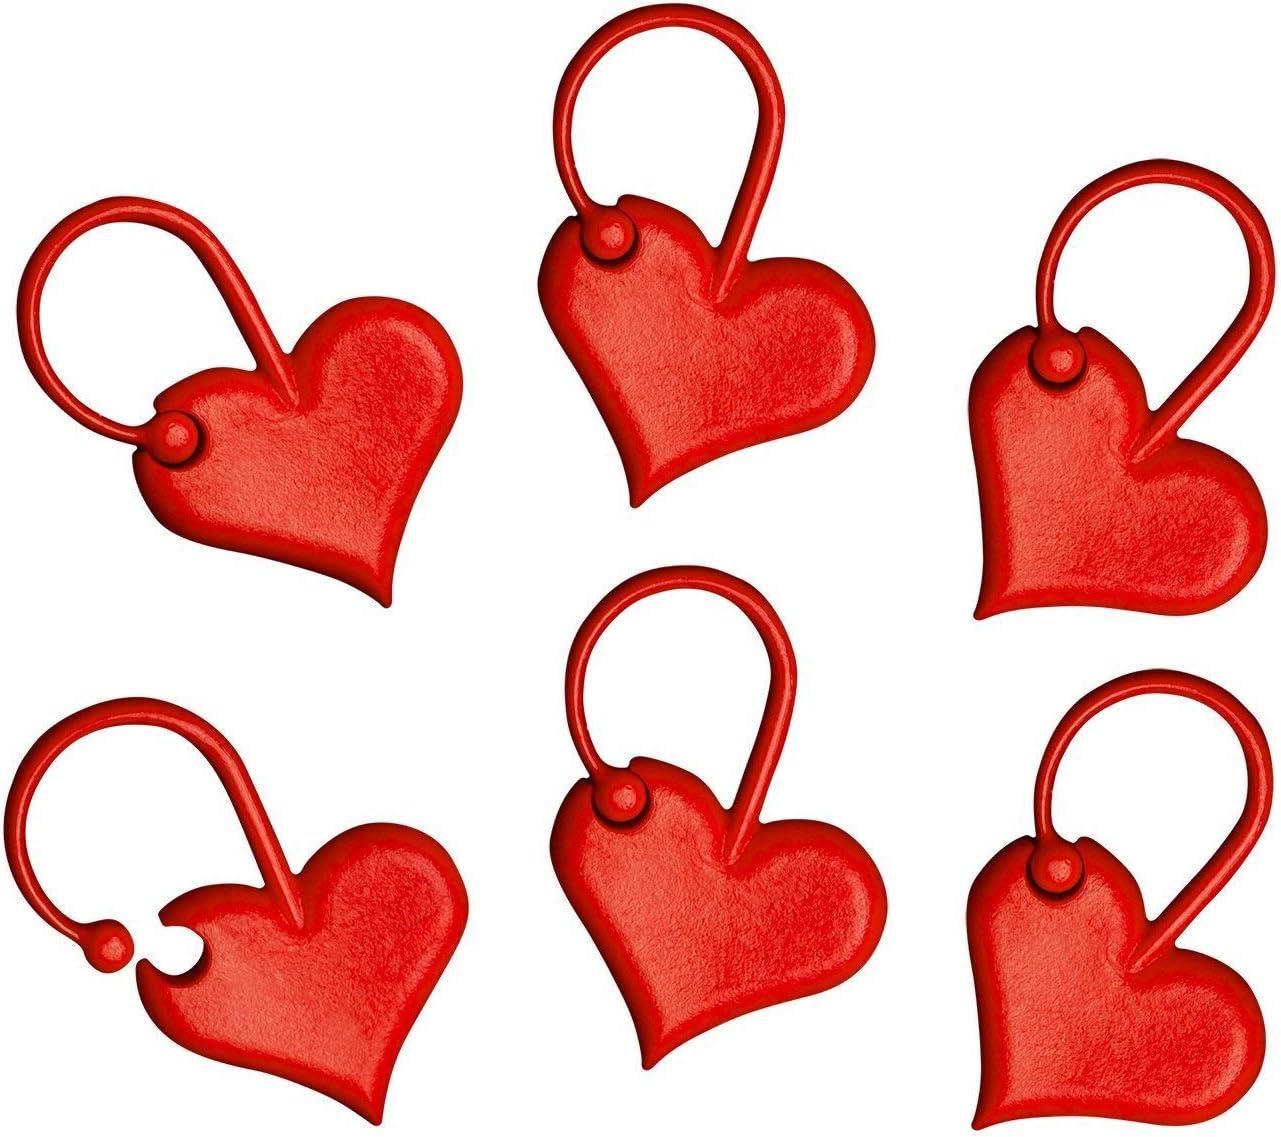 Heart Stitch Markers Stitch Marker Set Filigree Heart Stitch Markers Bead Stitch Marker Round Stitch Marker Stitch Markers